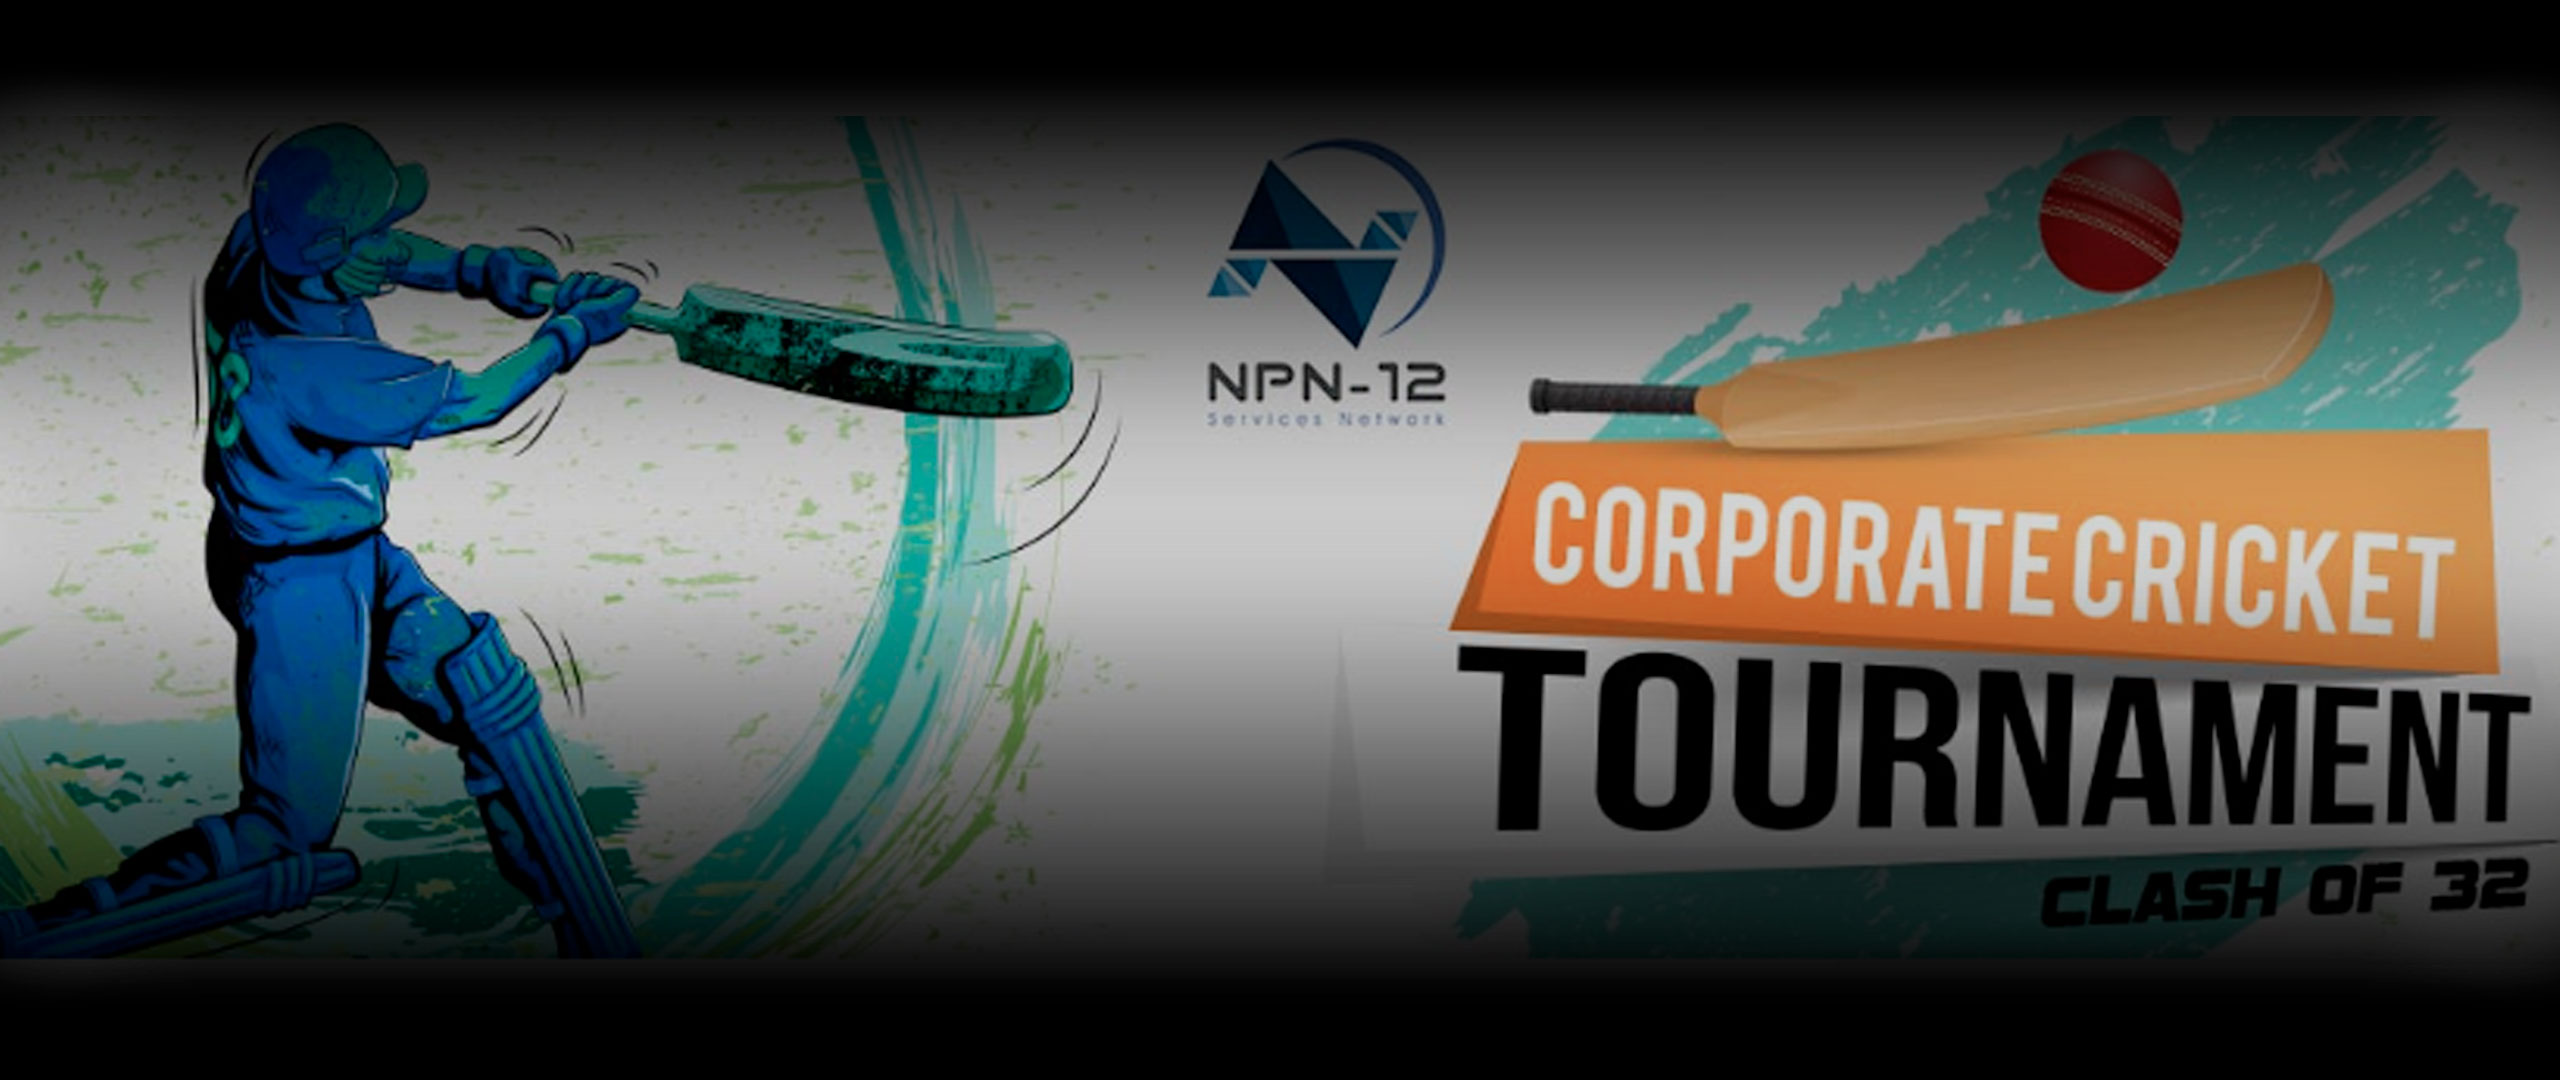 Corporate Cricket Tournament Clash Of 32